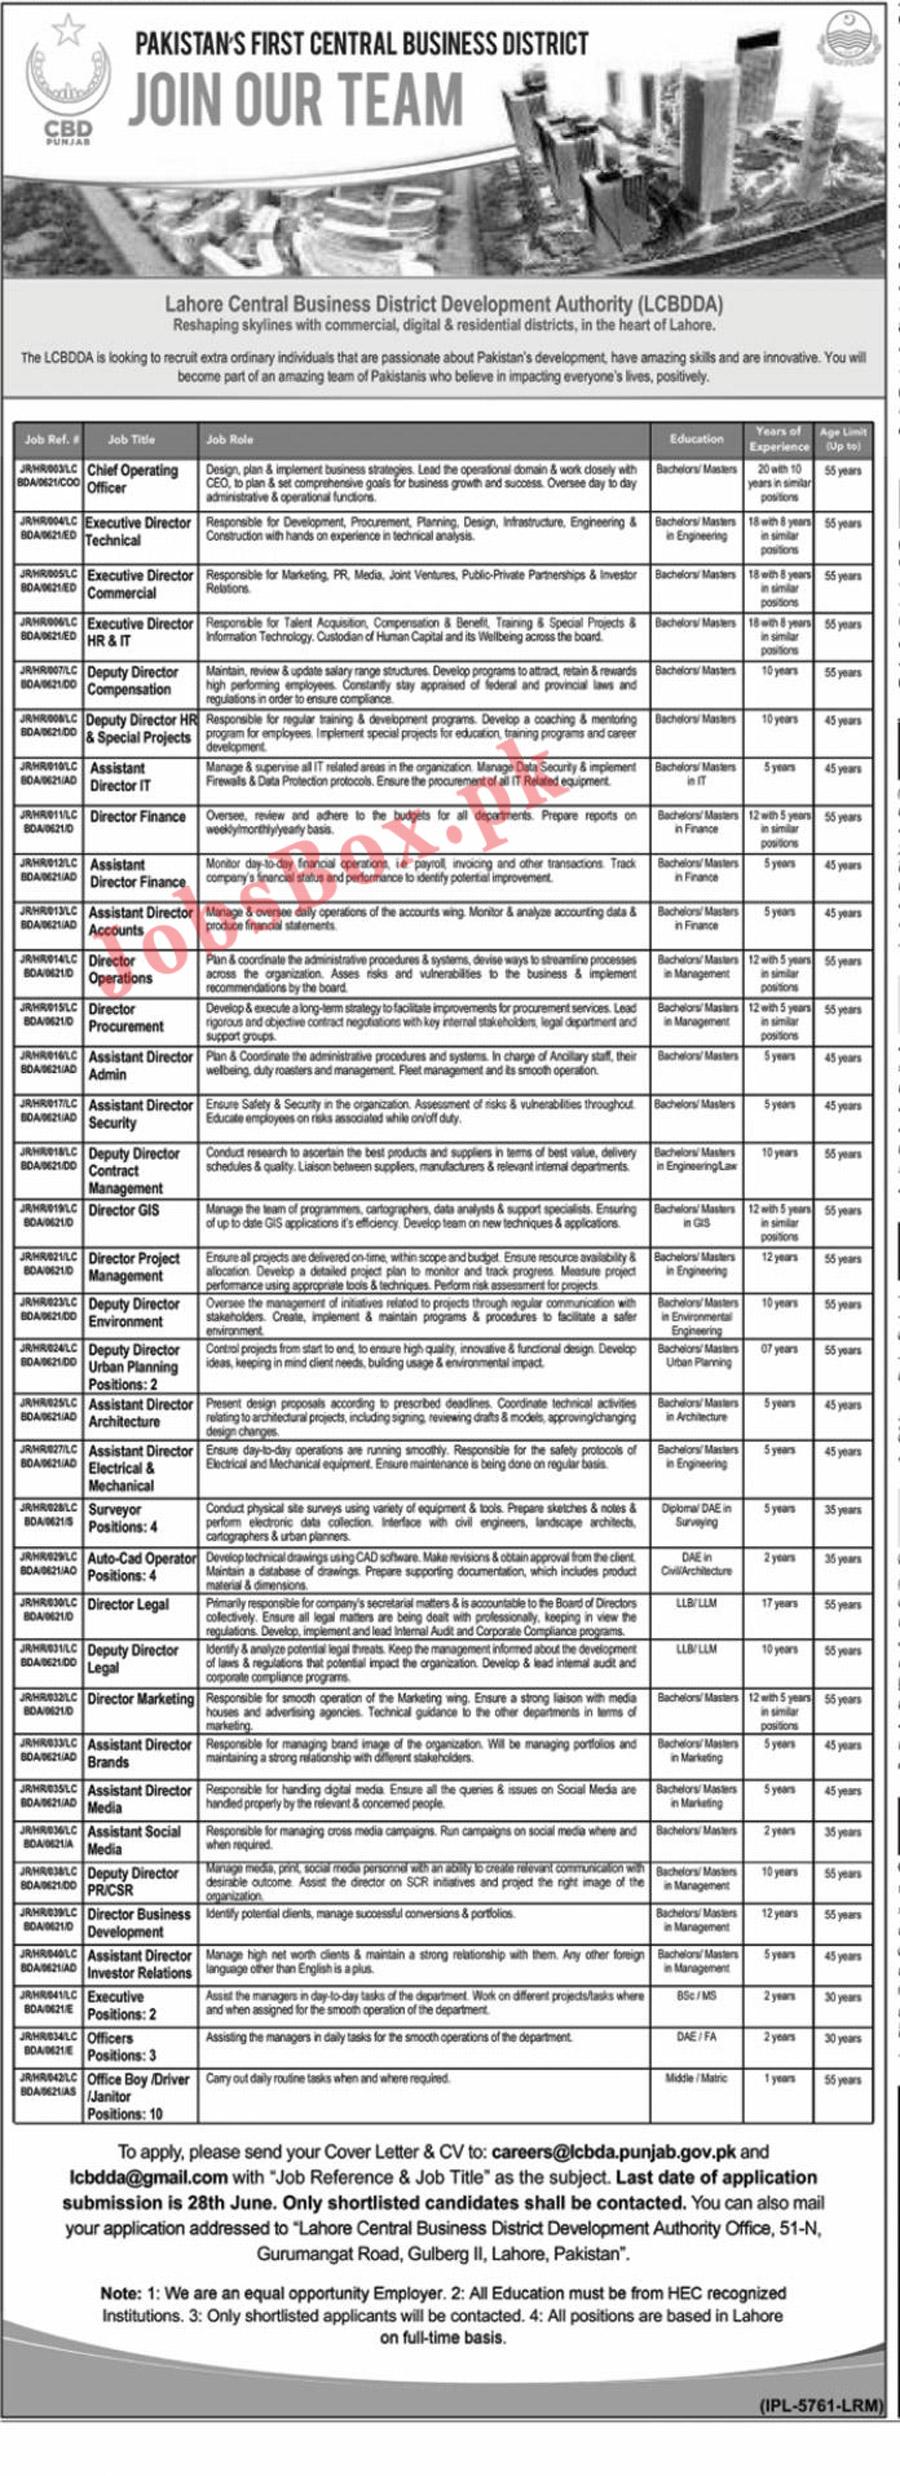 Lahore Central Business District Development Authority LCBDDA Jobs 2021 Latest Vacancies - Apply at careers@lcbda.punjab.gov.pk